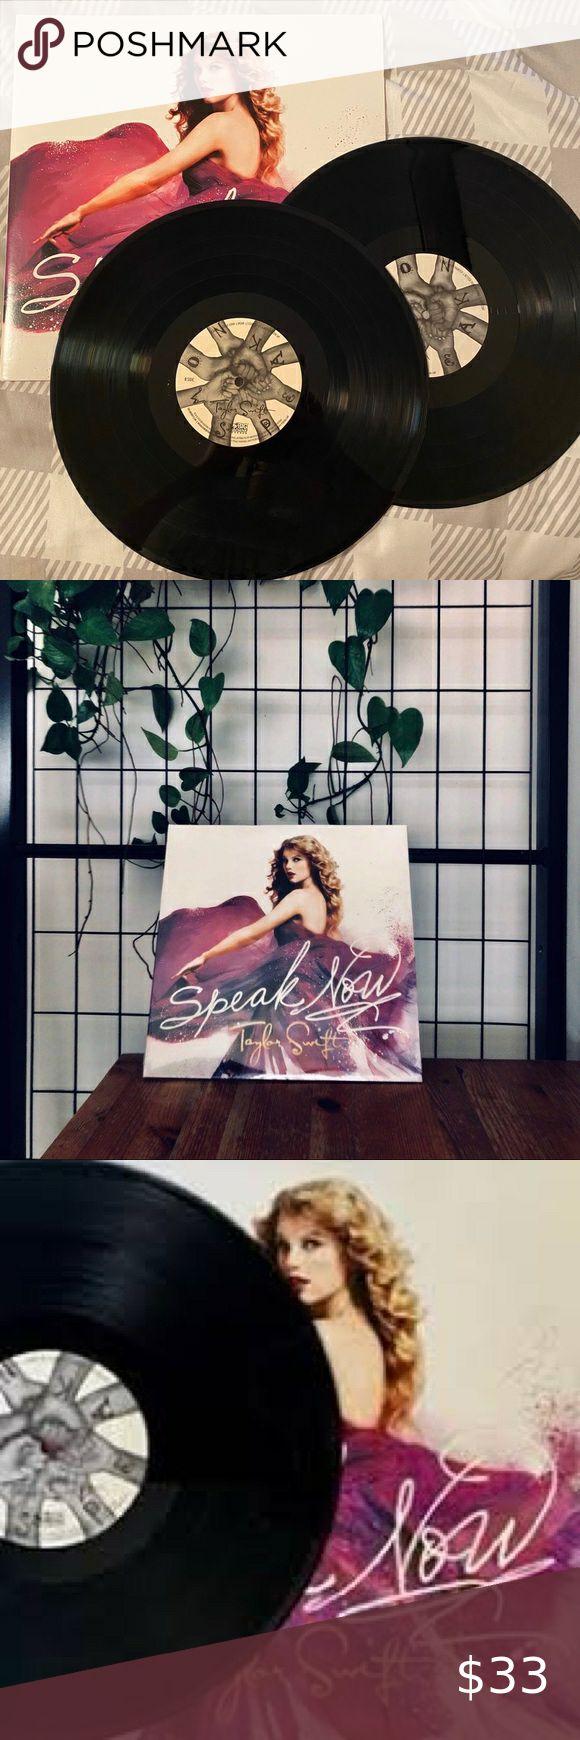 taylor swift speak now vinyl album record disc set ...